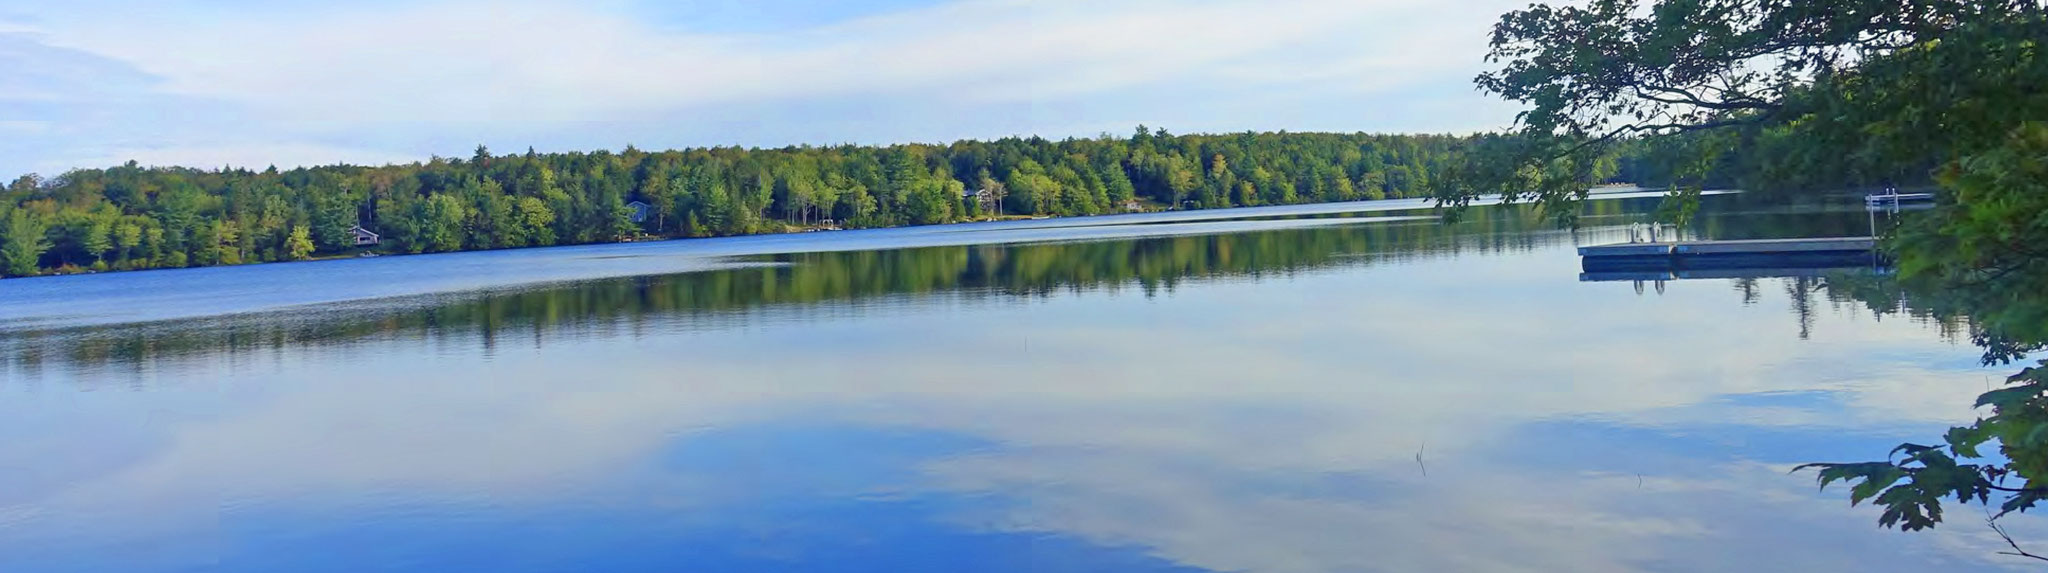 title:Little Lake,title2:See-Grundstück,provinz:Nova Scotia,bezirk:Digby,art:Ferienimmobilie,flaeche:8.053 m²,ufer:175 Meter,preis:35.000 €